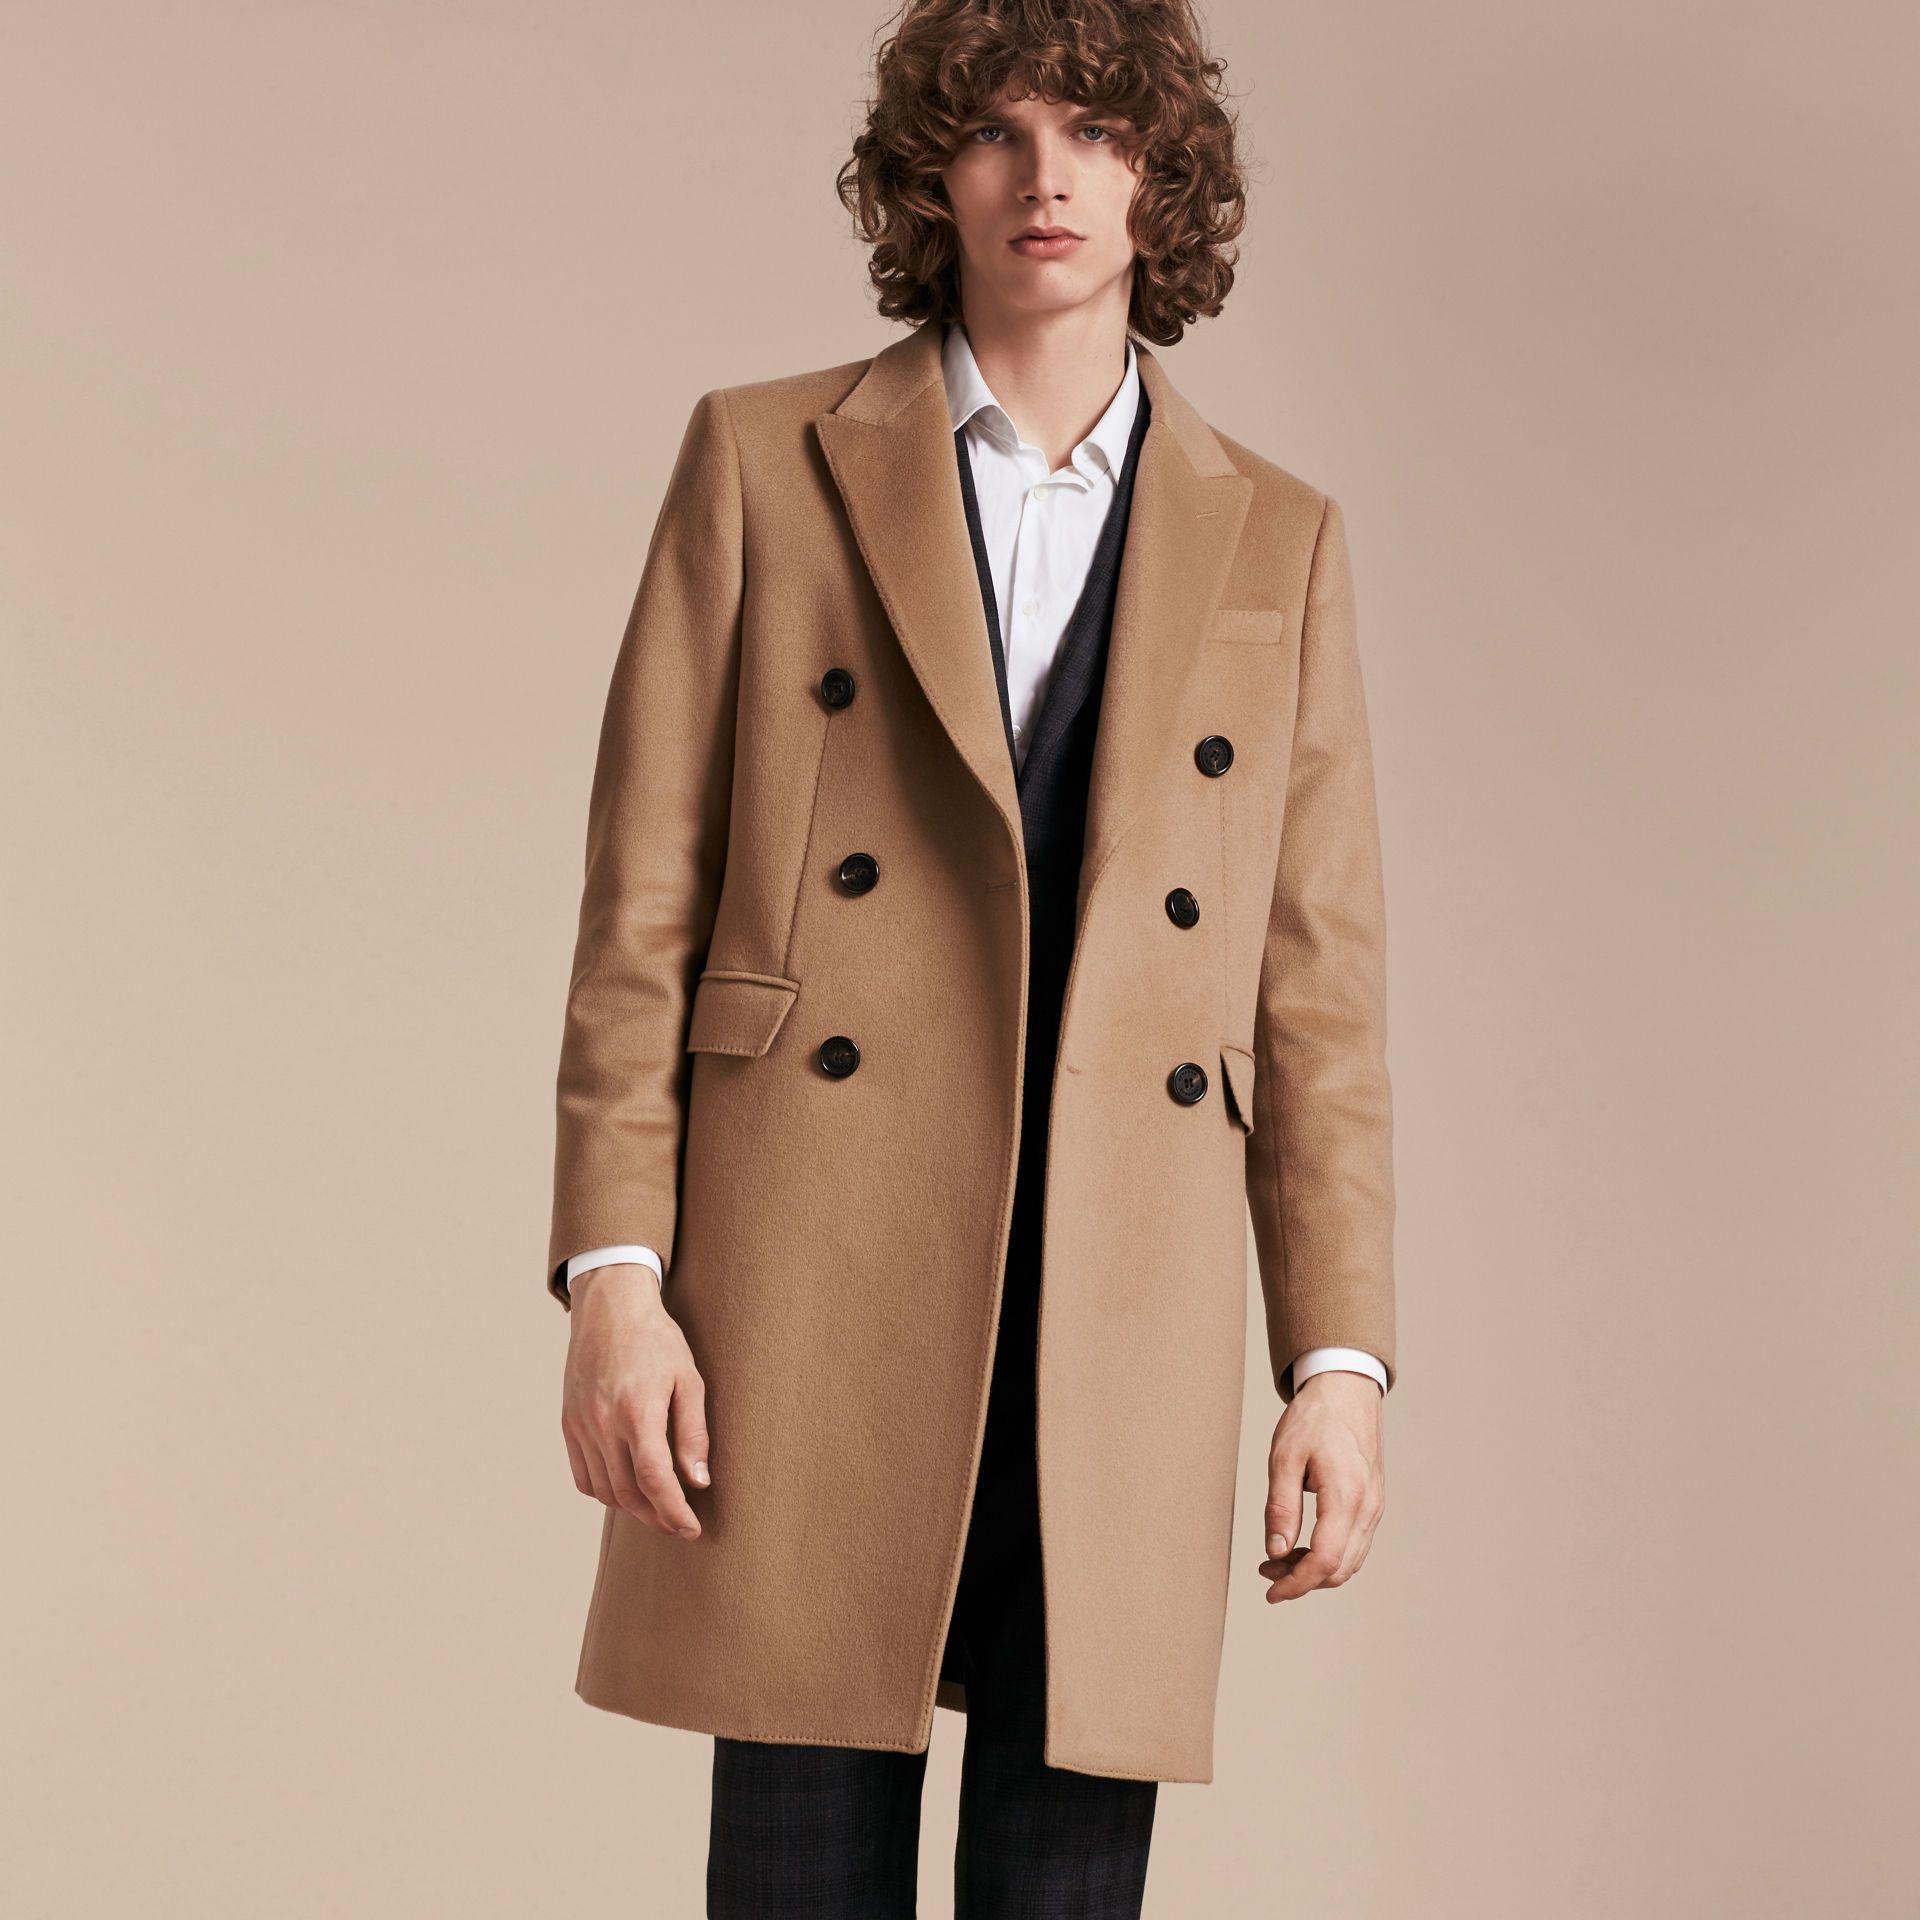 Men's Coats & Jackets | Burberry United States